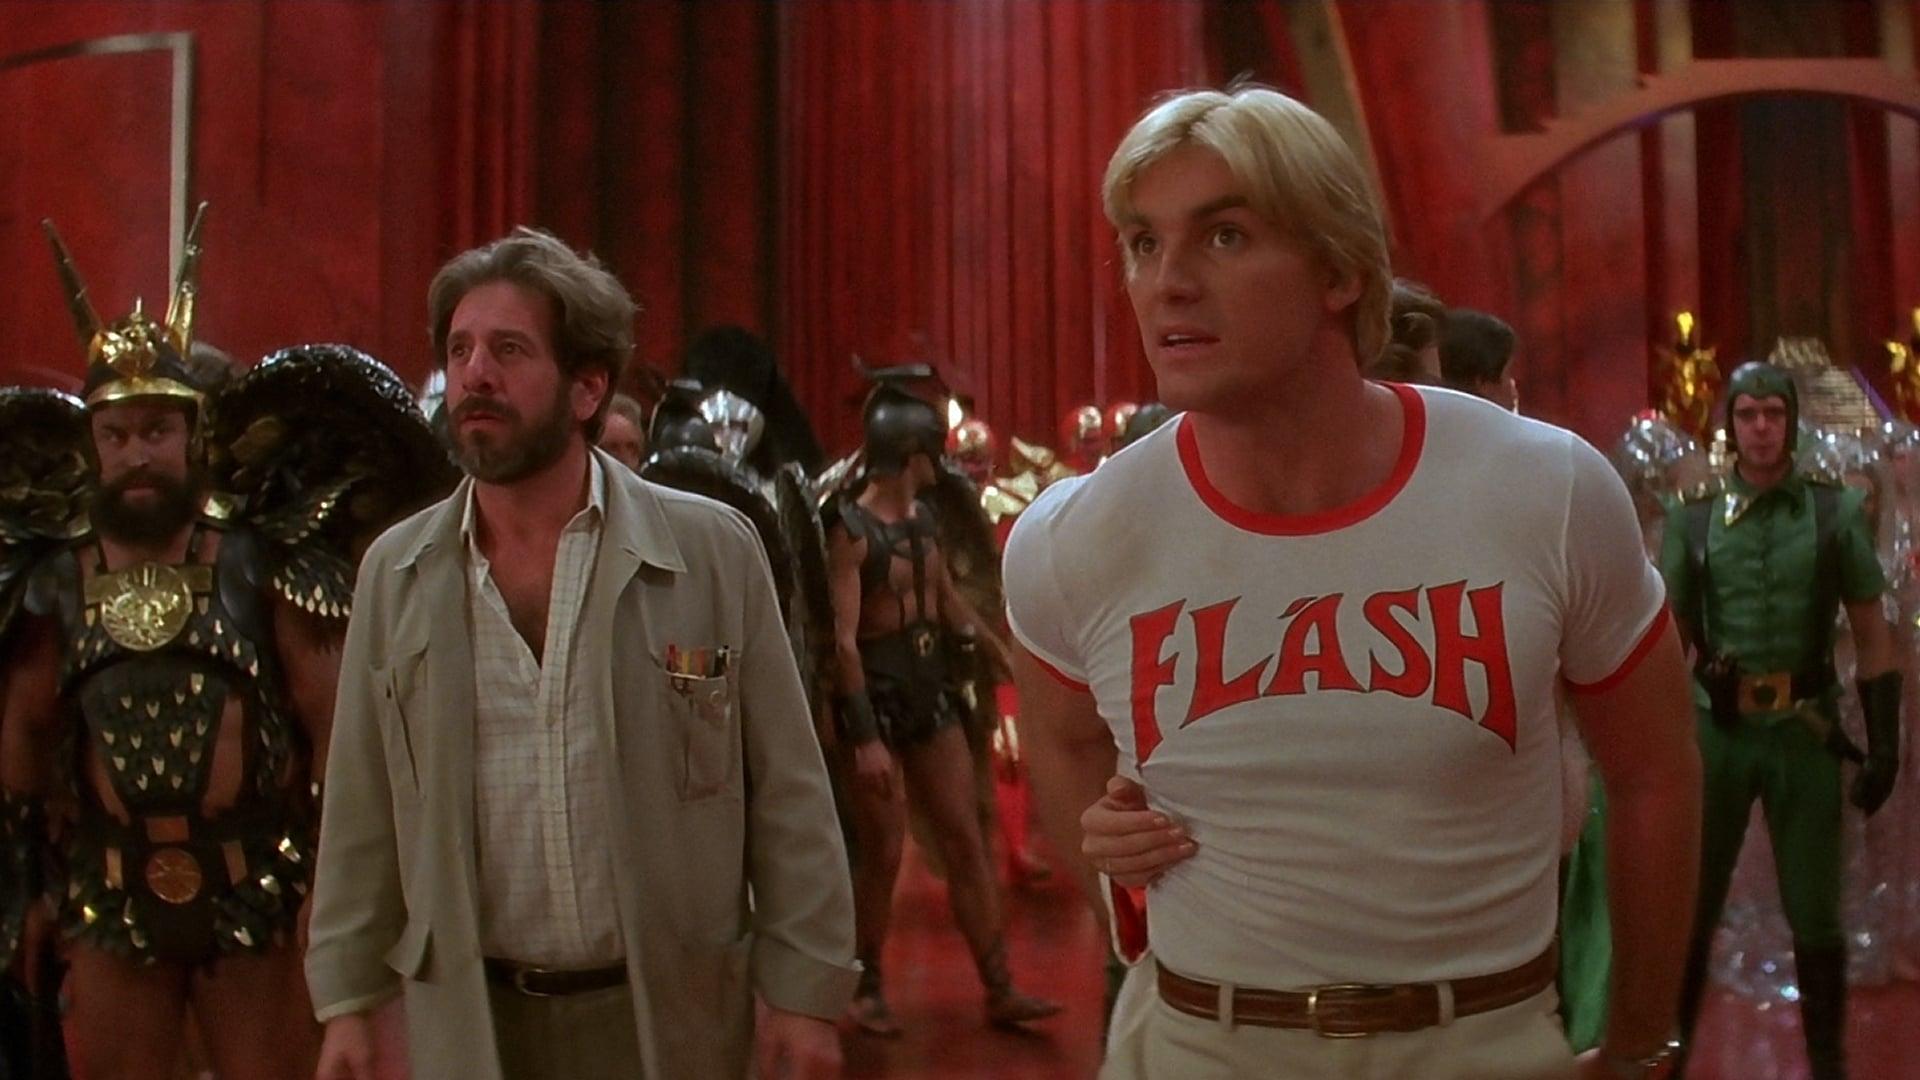 Flash Gordon backdrop